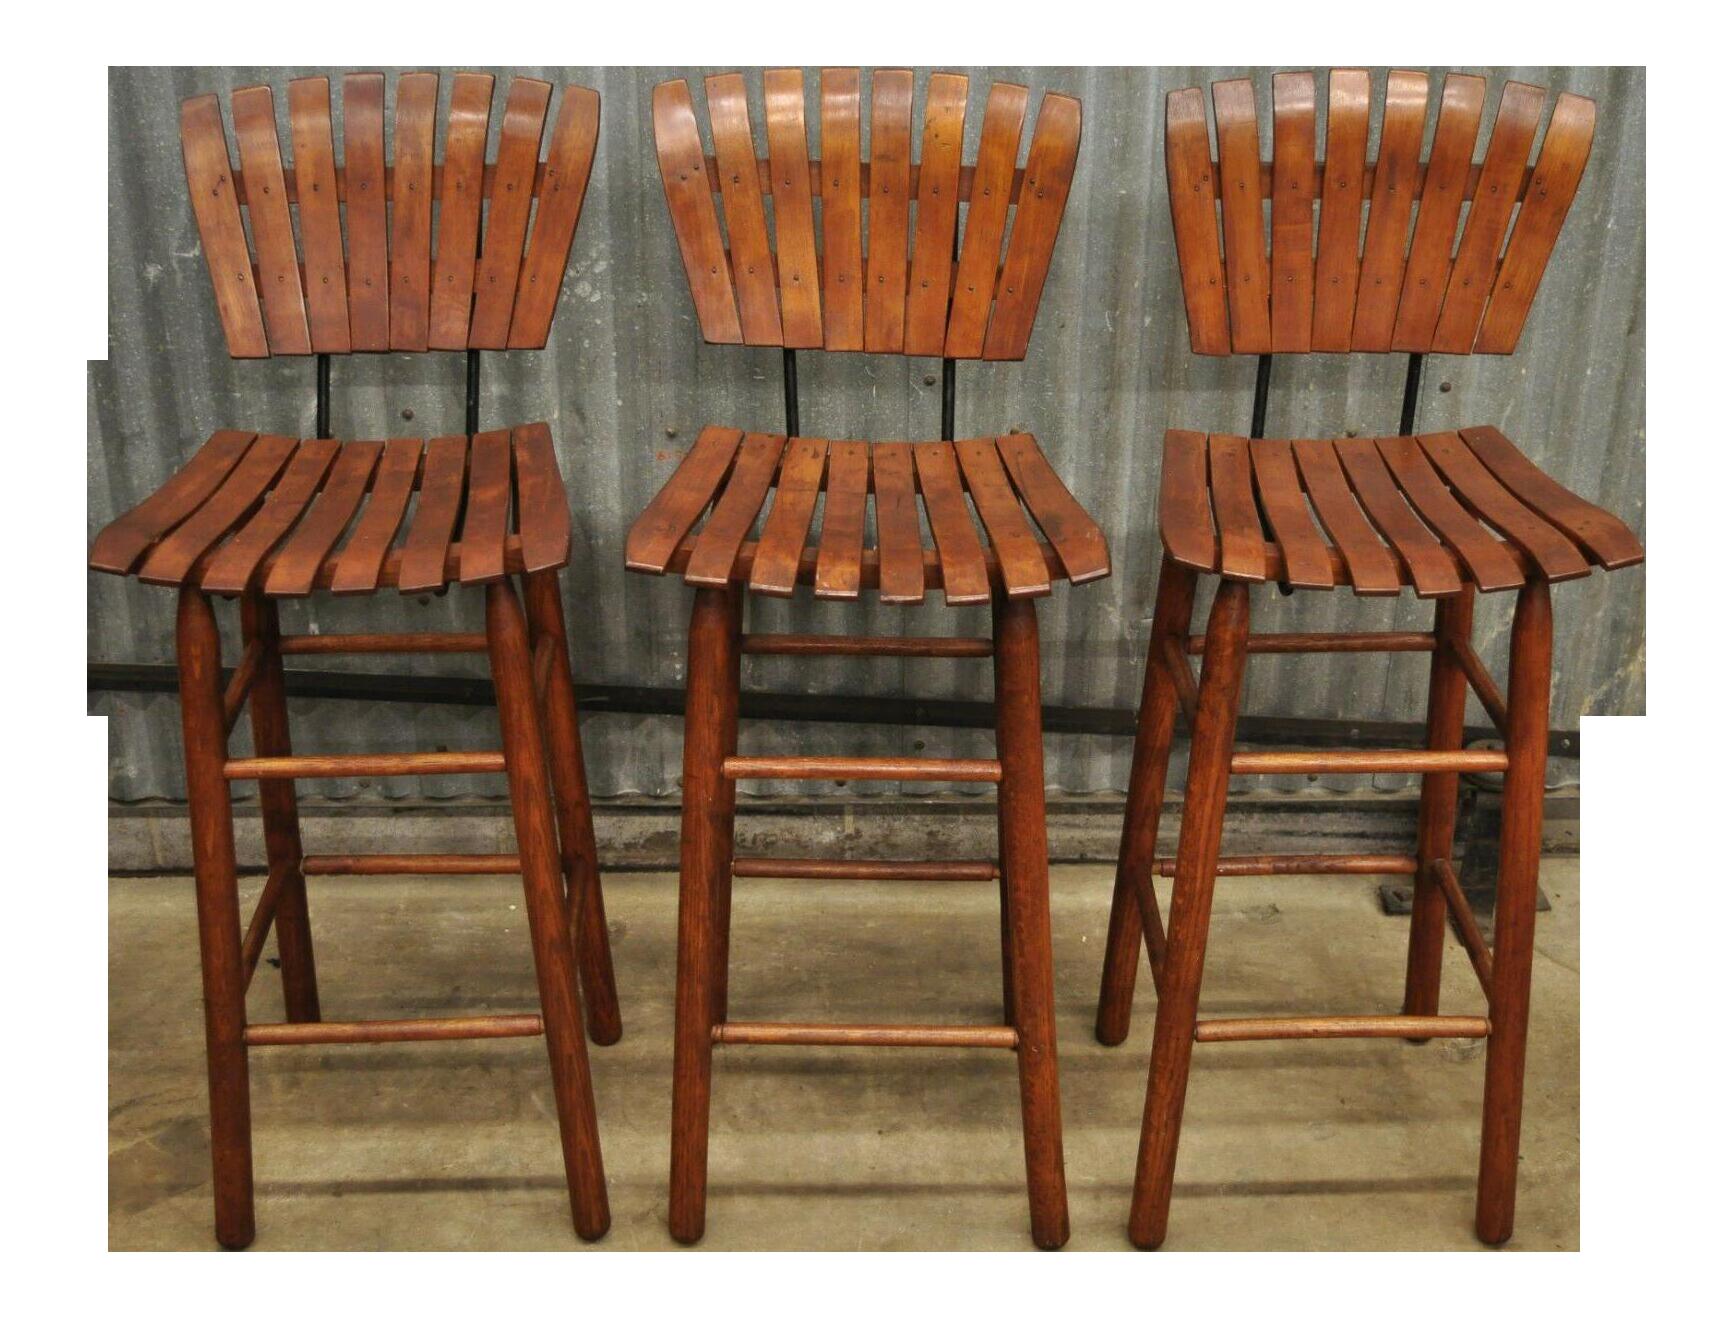 3 Vintage Mid Century Modern Arthur Umanoff Wood Slatted Wooden Bar Stools Chairish